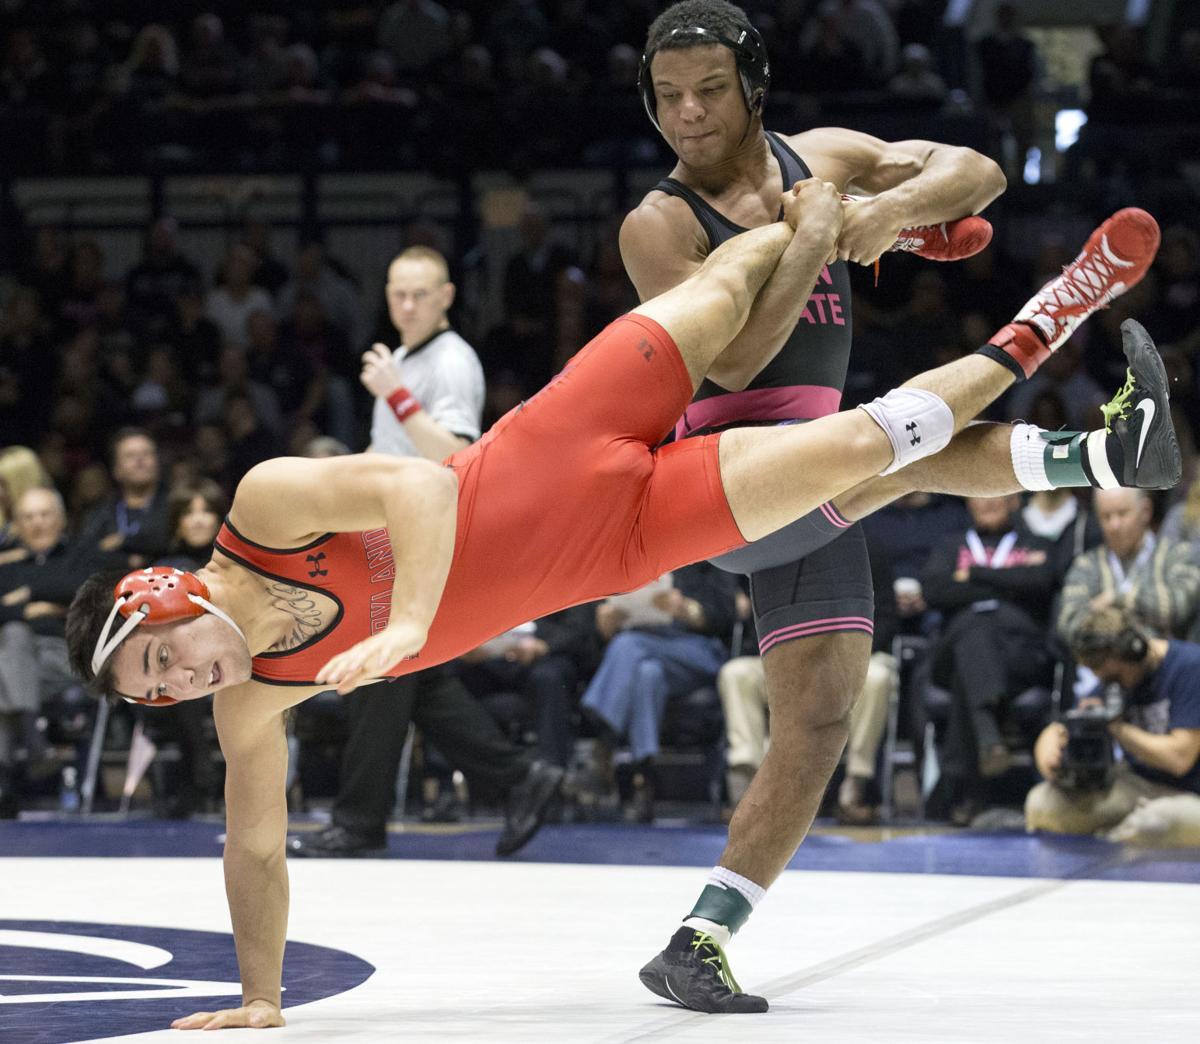 Penn State wrestling's Mark Hall has impressive first ...